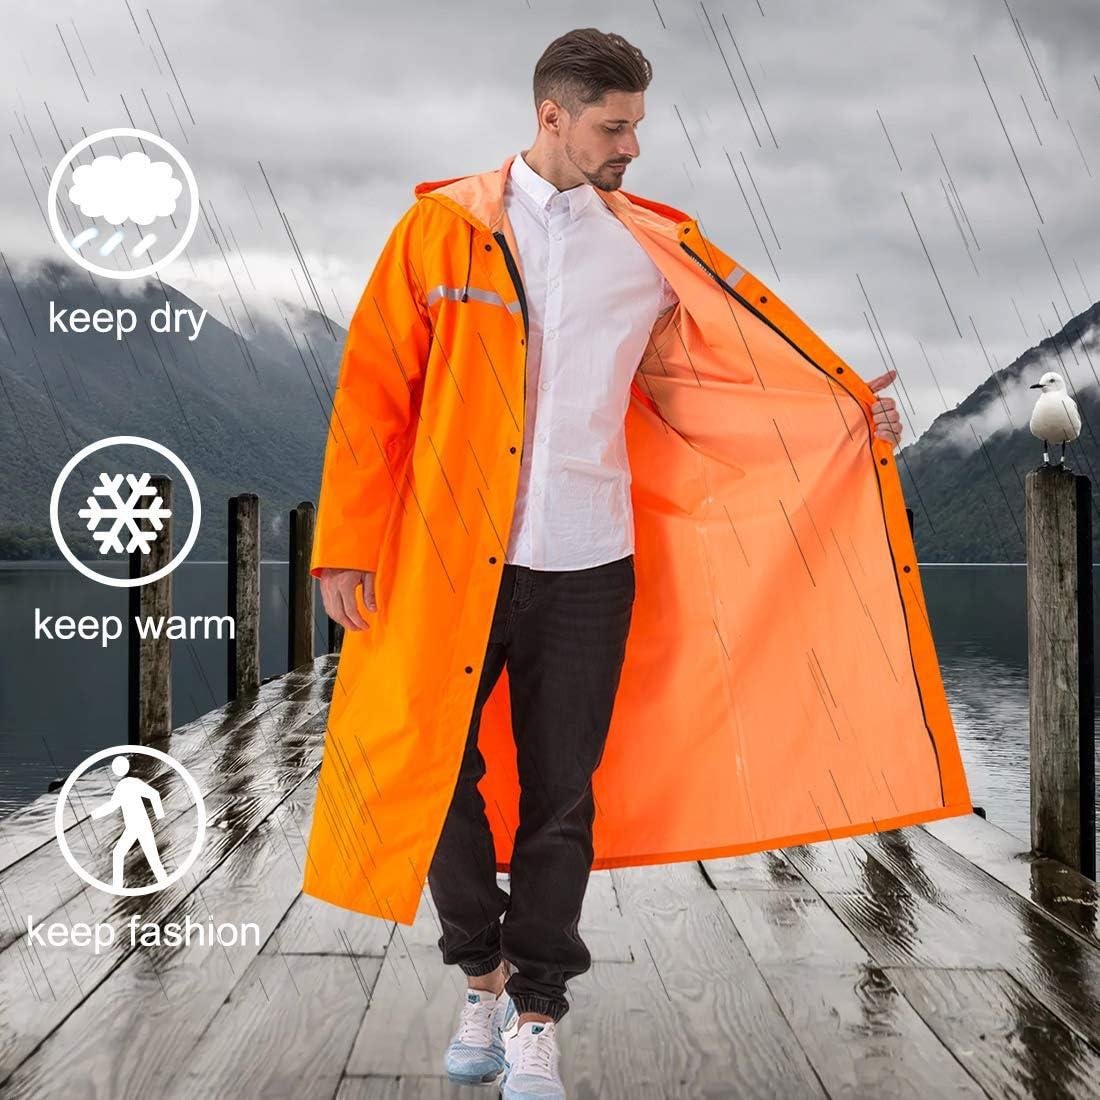 Panegy Waterproof Raincoat Long Hooded Rain Poncho Windbreaker Reflective Jacket Lightweight